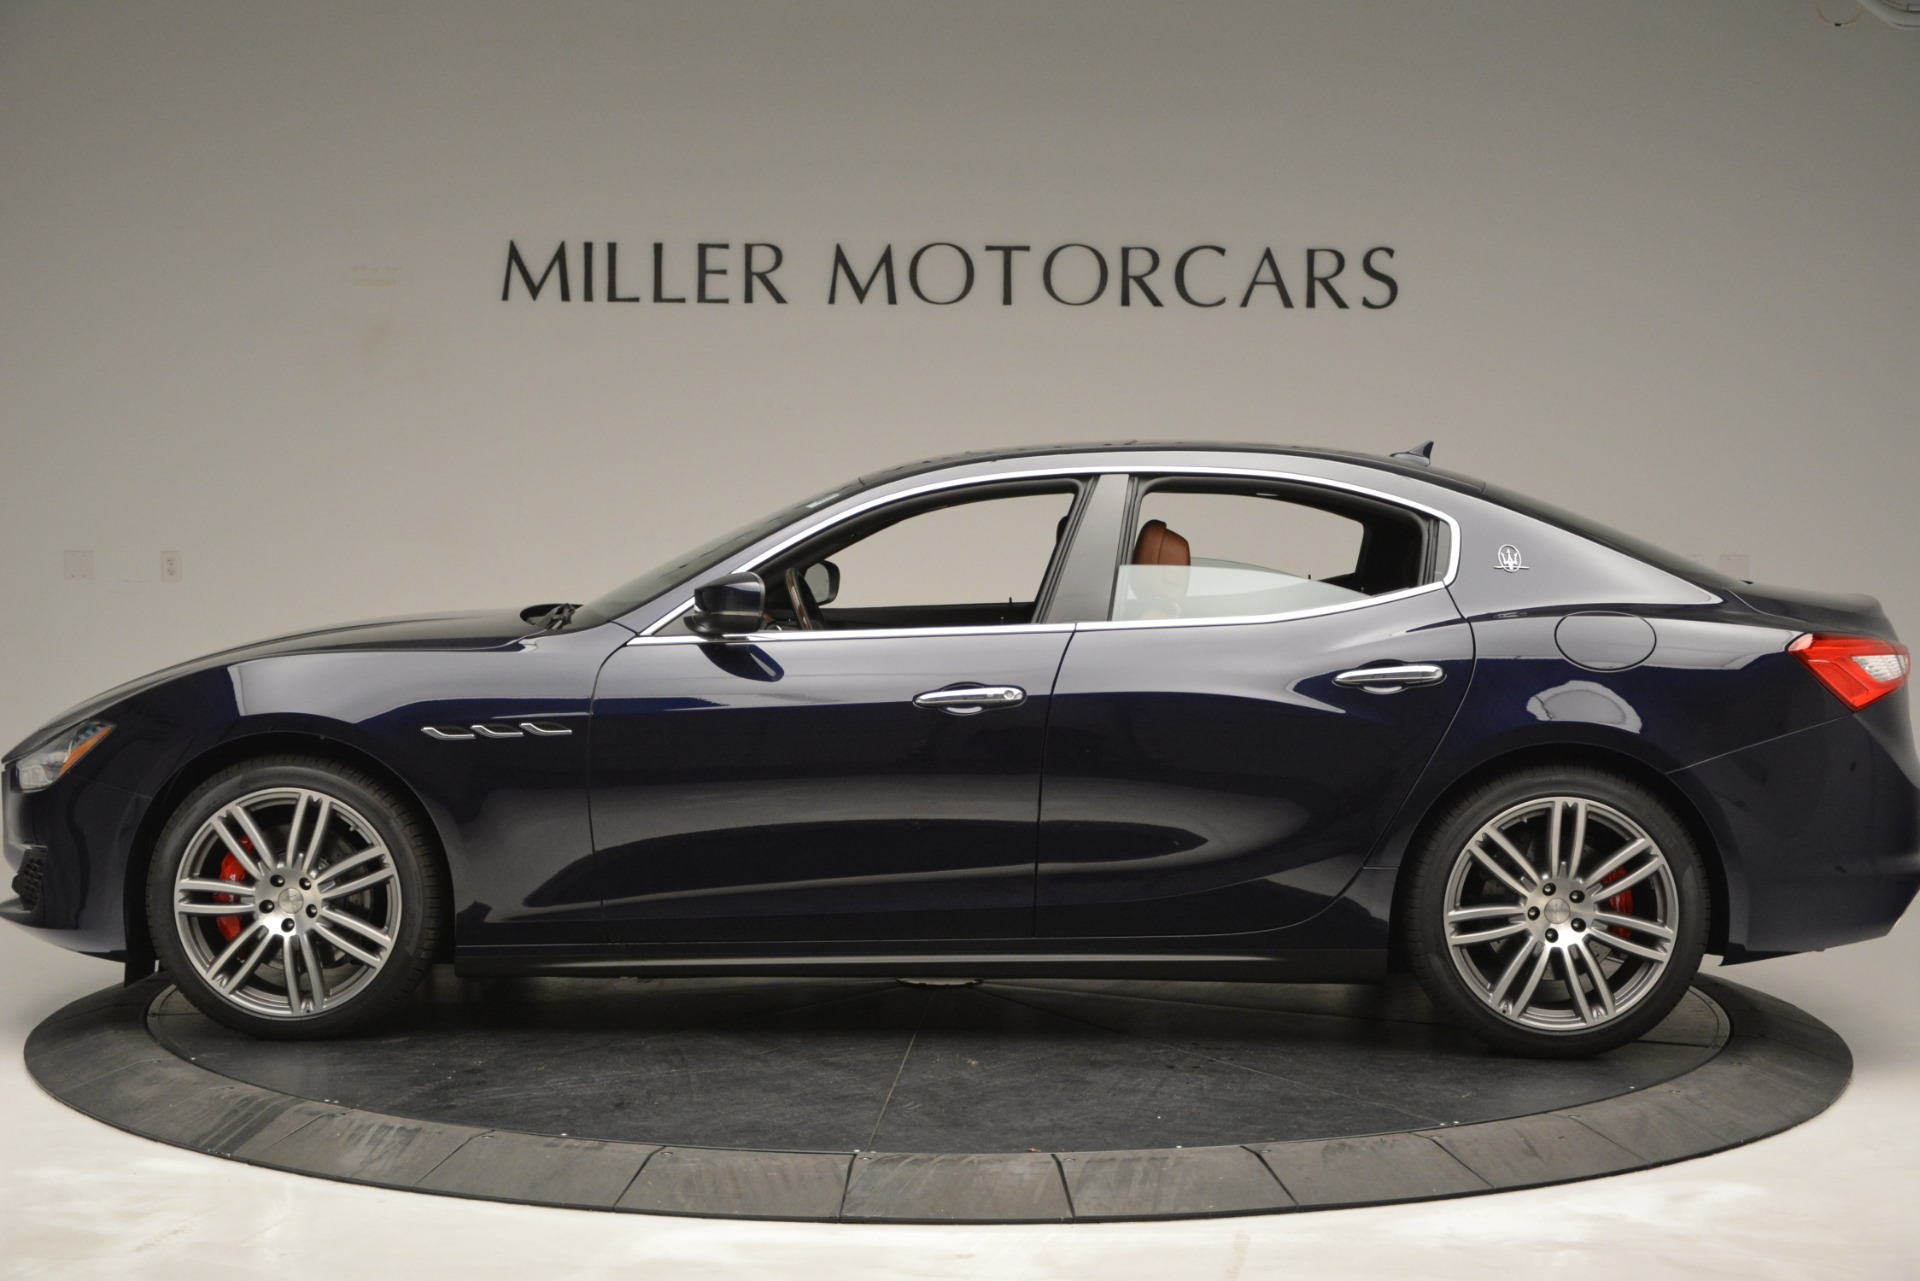 New 2019 Maserati Ghibli S Q4 For Sale In Westport, CT 2738_p3